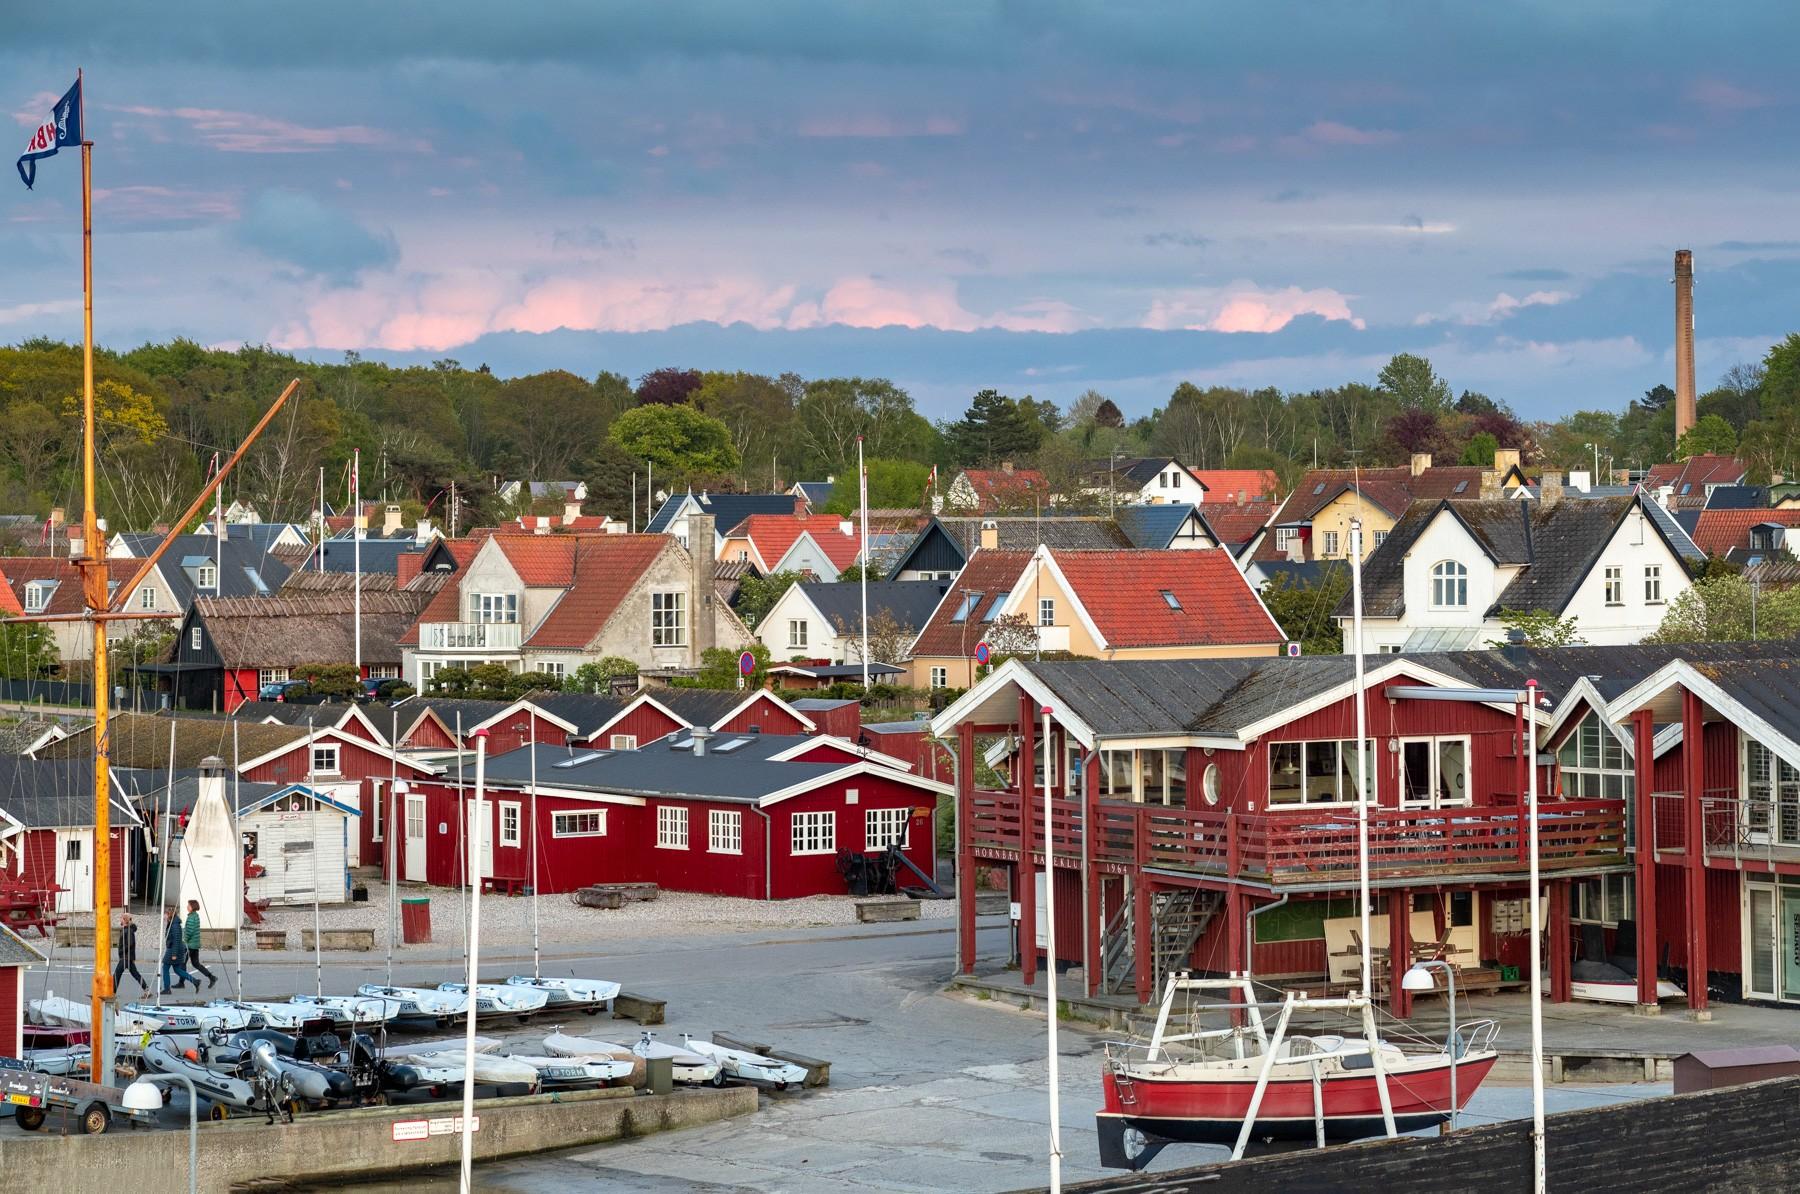 Downtown Hornbæk Strand